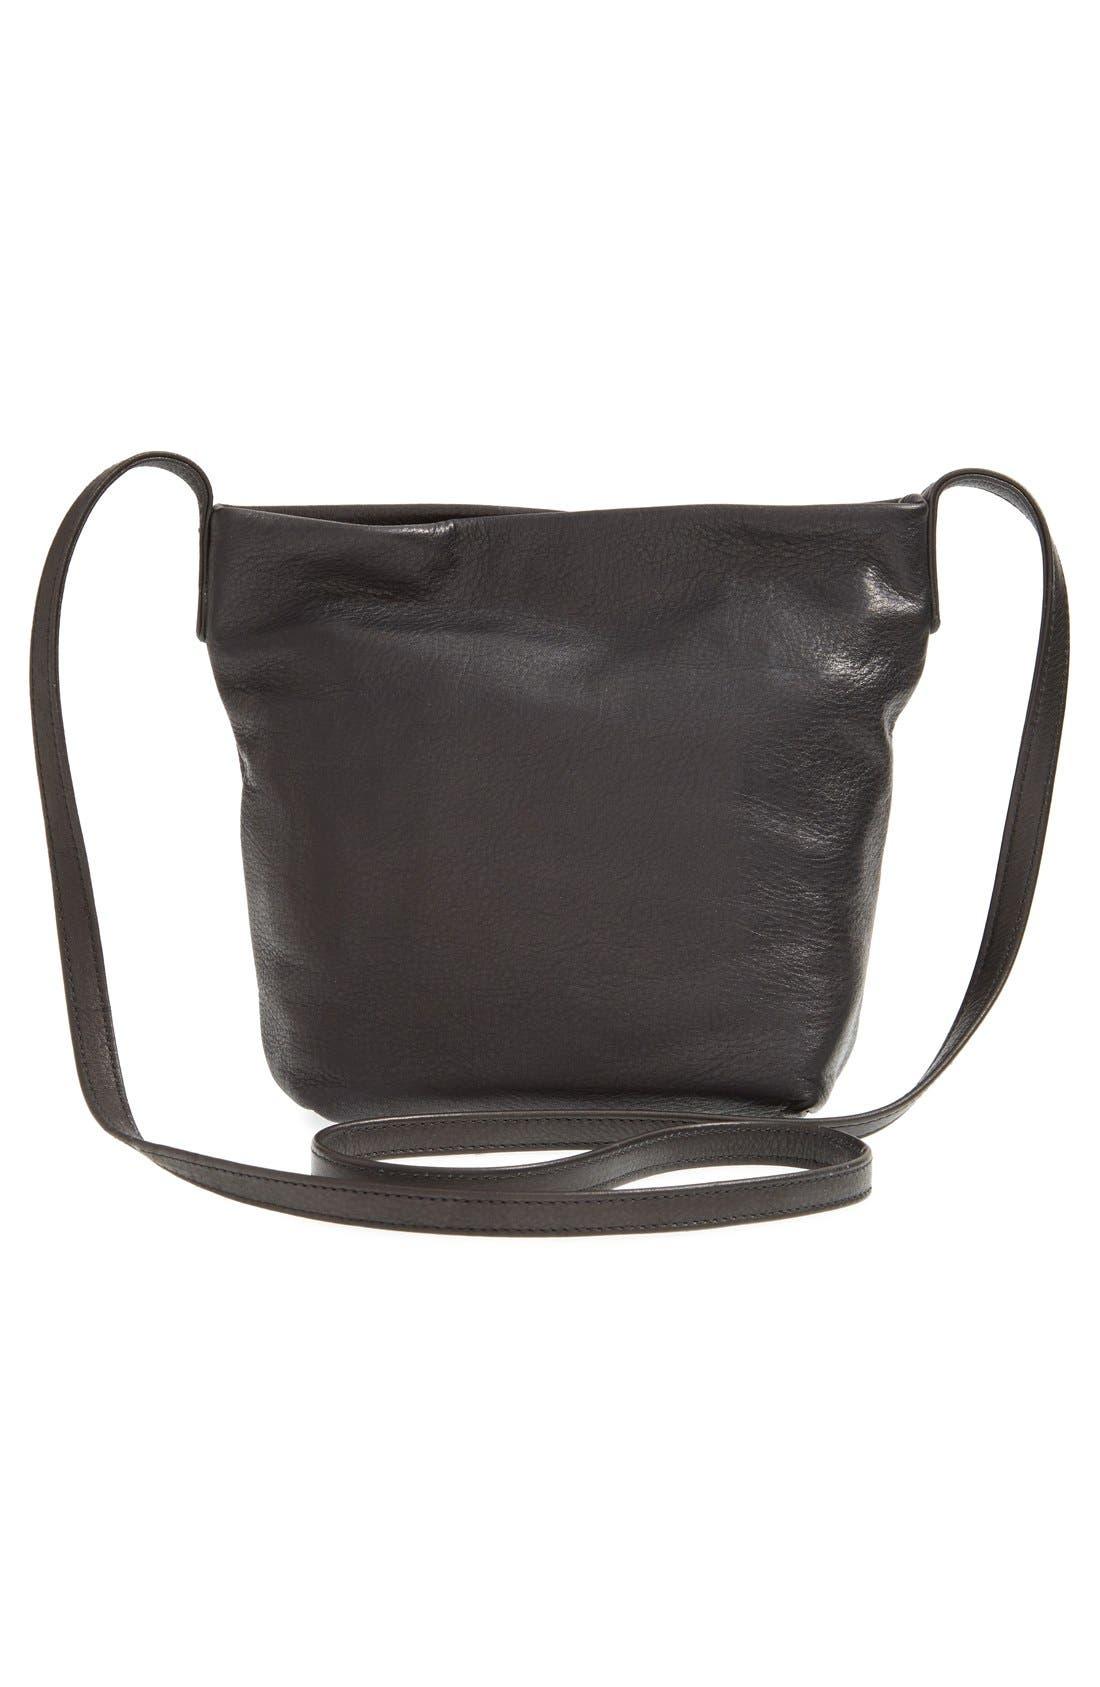 BAGGU,                              Leather Crossbody Bag,                             Alternate thumbnail 3, color,                             004